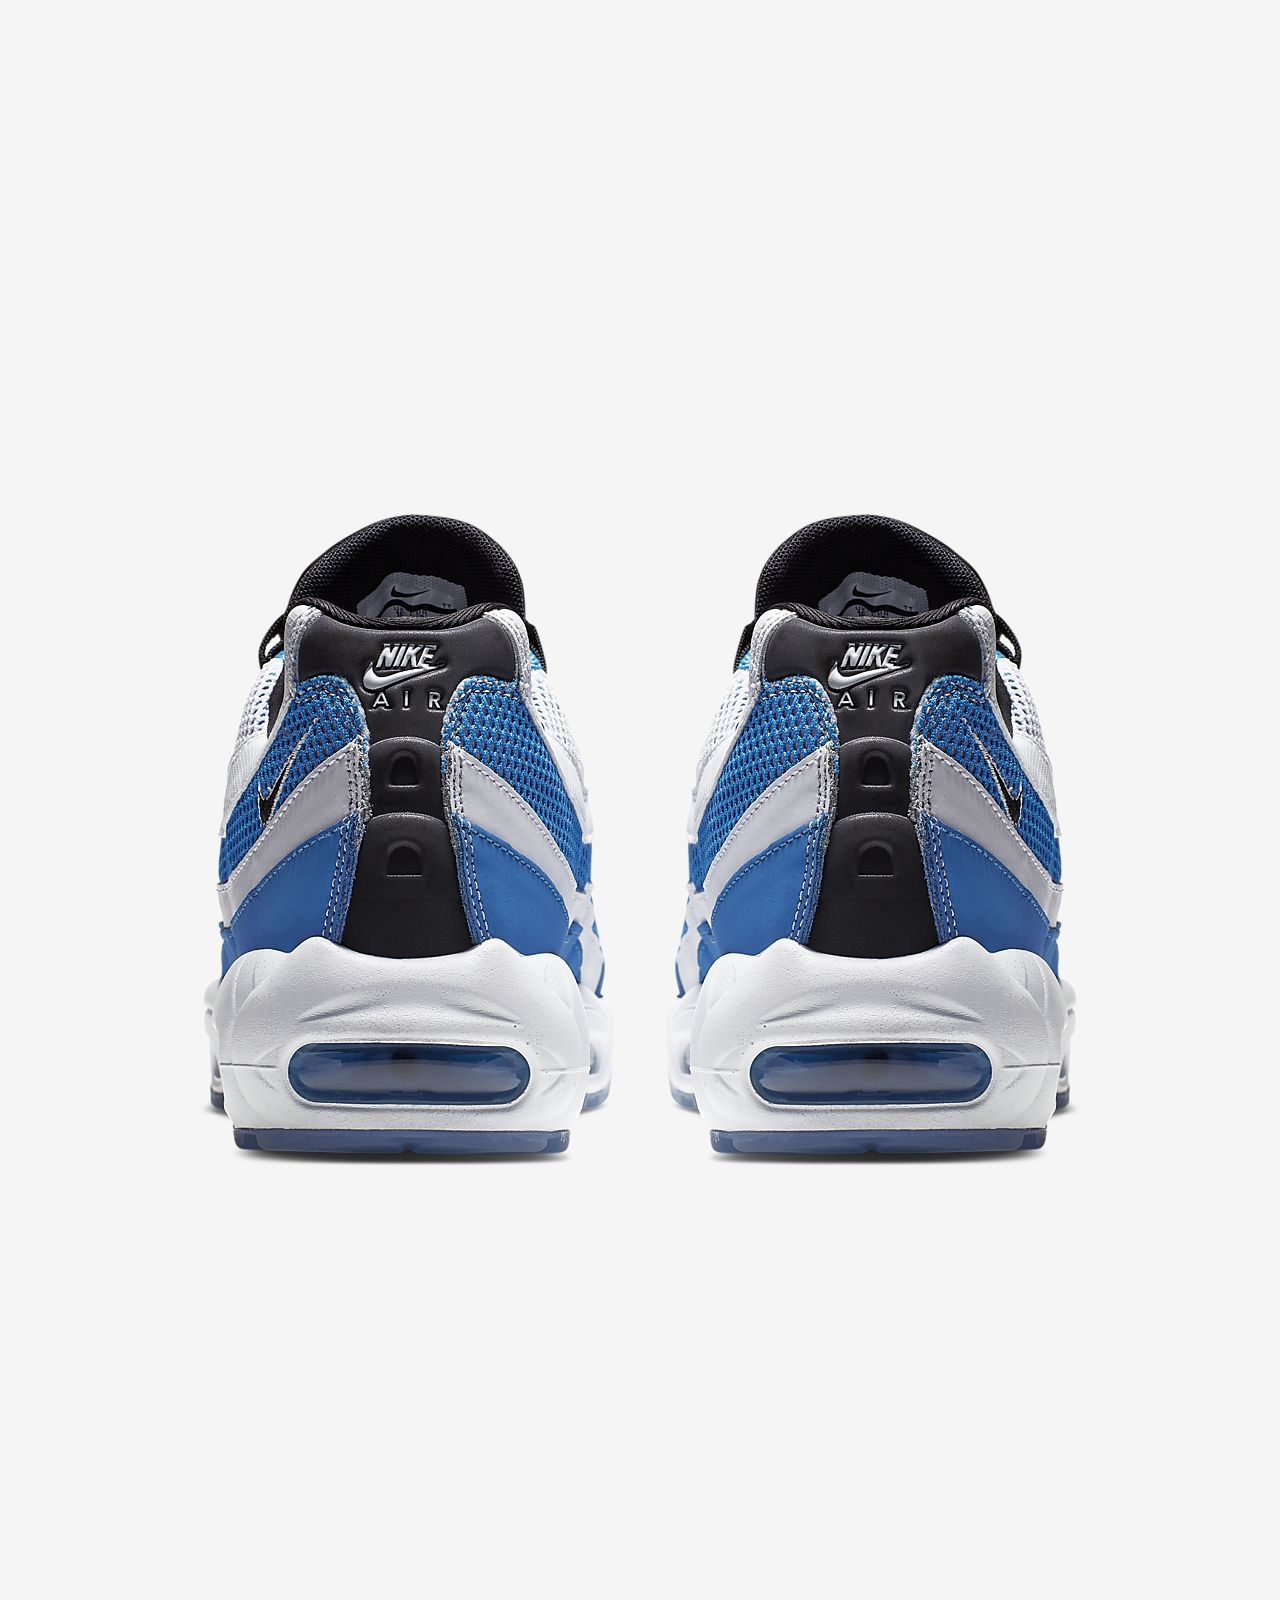 Hot Sale Nike Air Max 95 Essential Sport Turqoiuse Bone Black White 749766 027 Men's Casual Trainers Running Shoes 749766 027